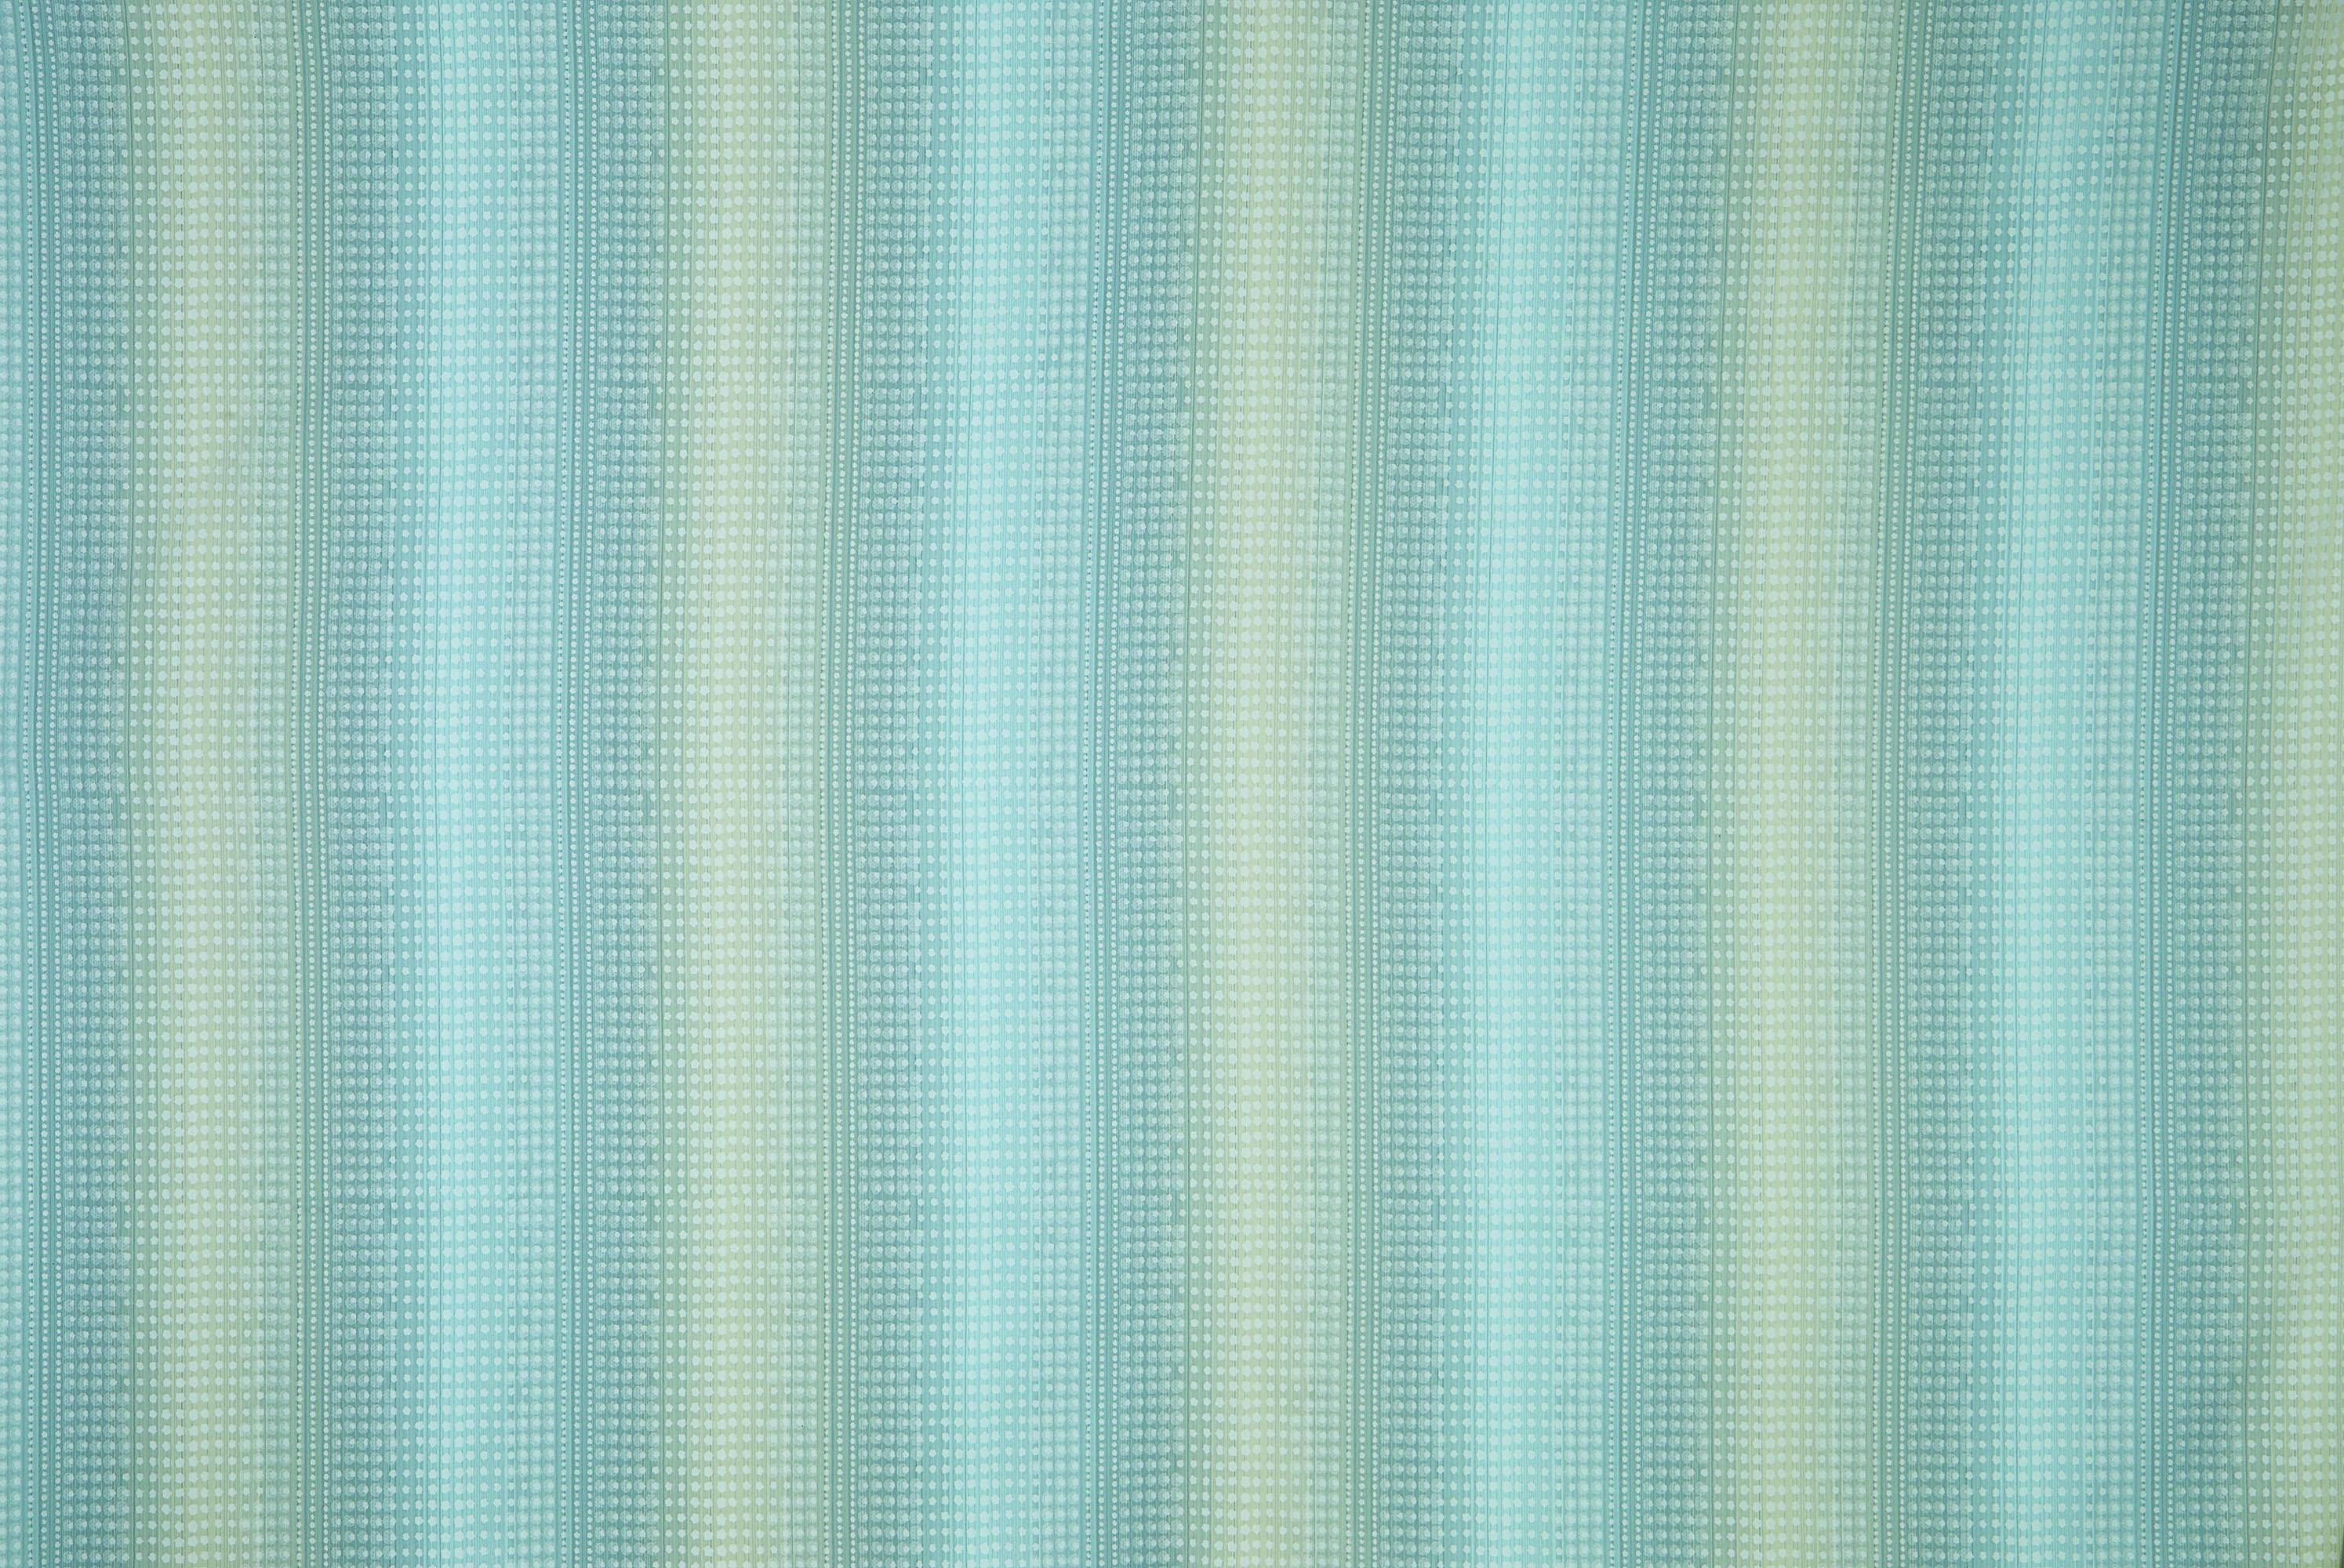 1205_Nexus_Seaglass_3_RR